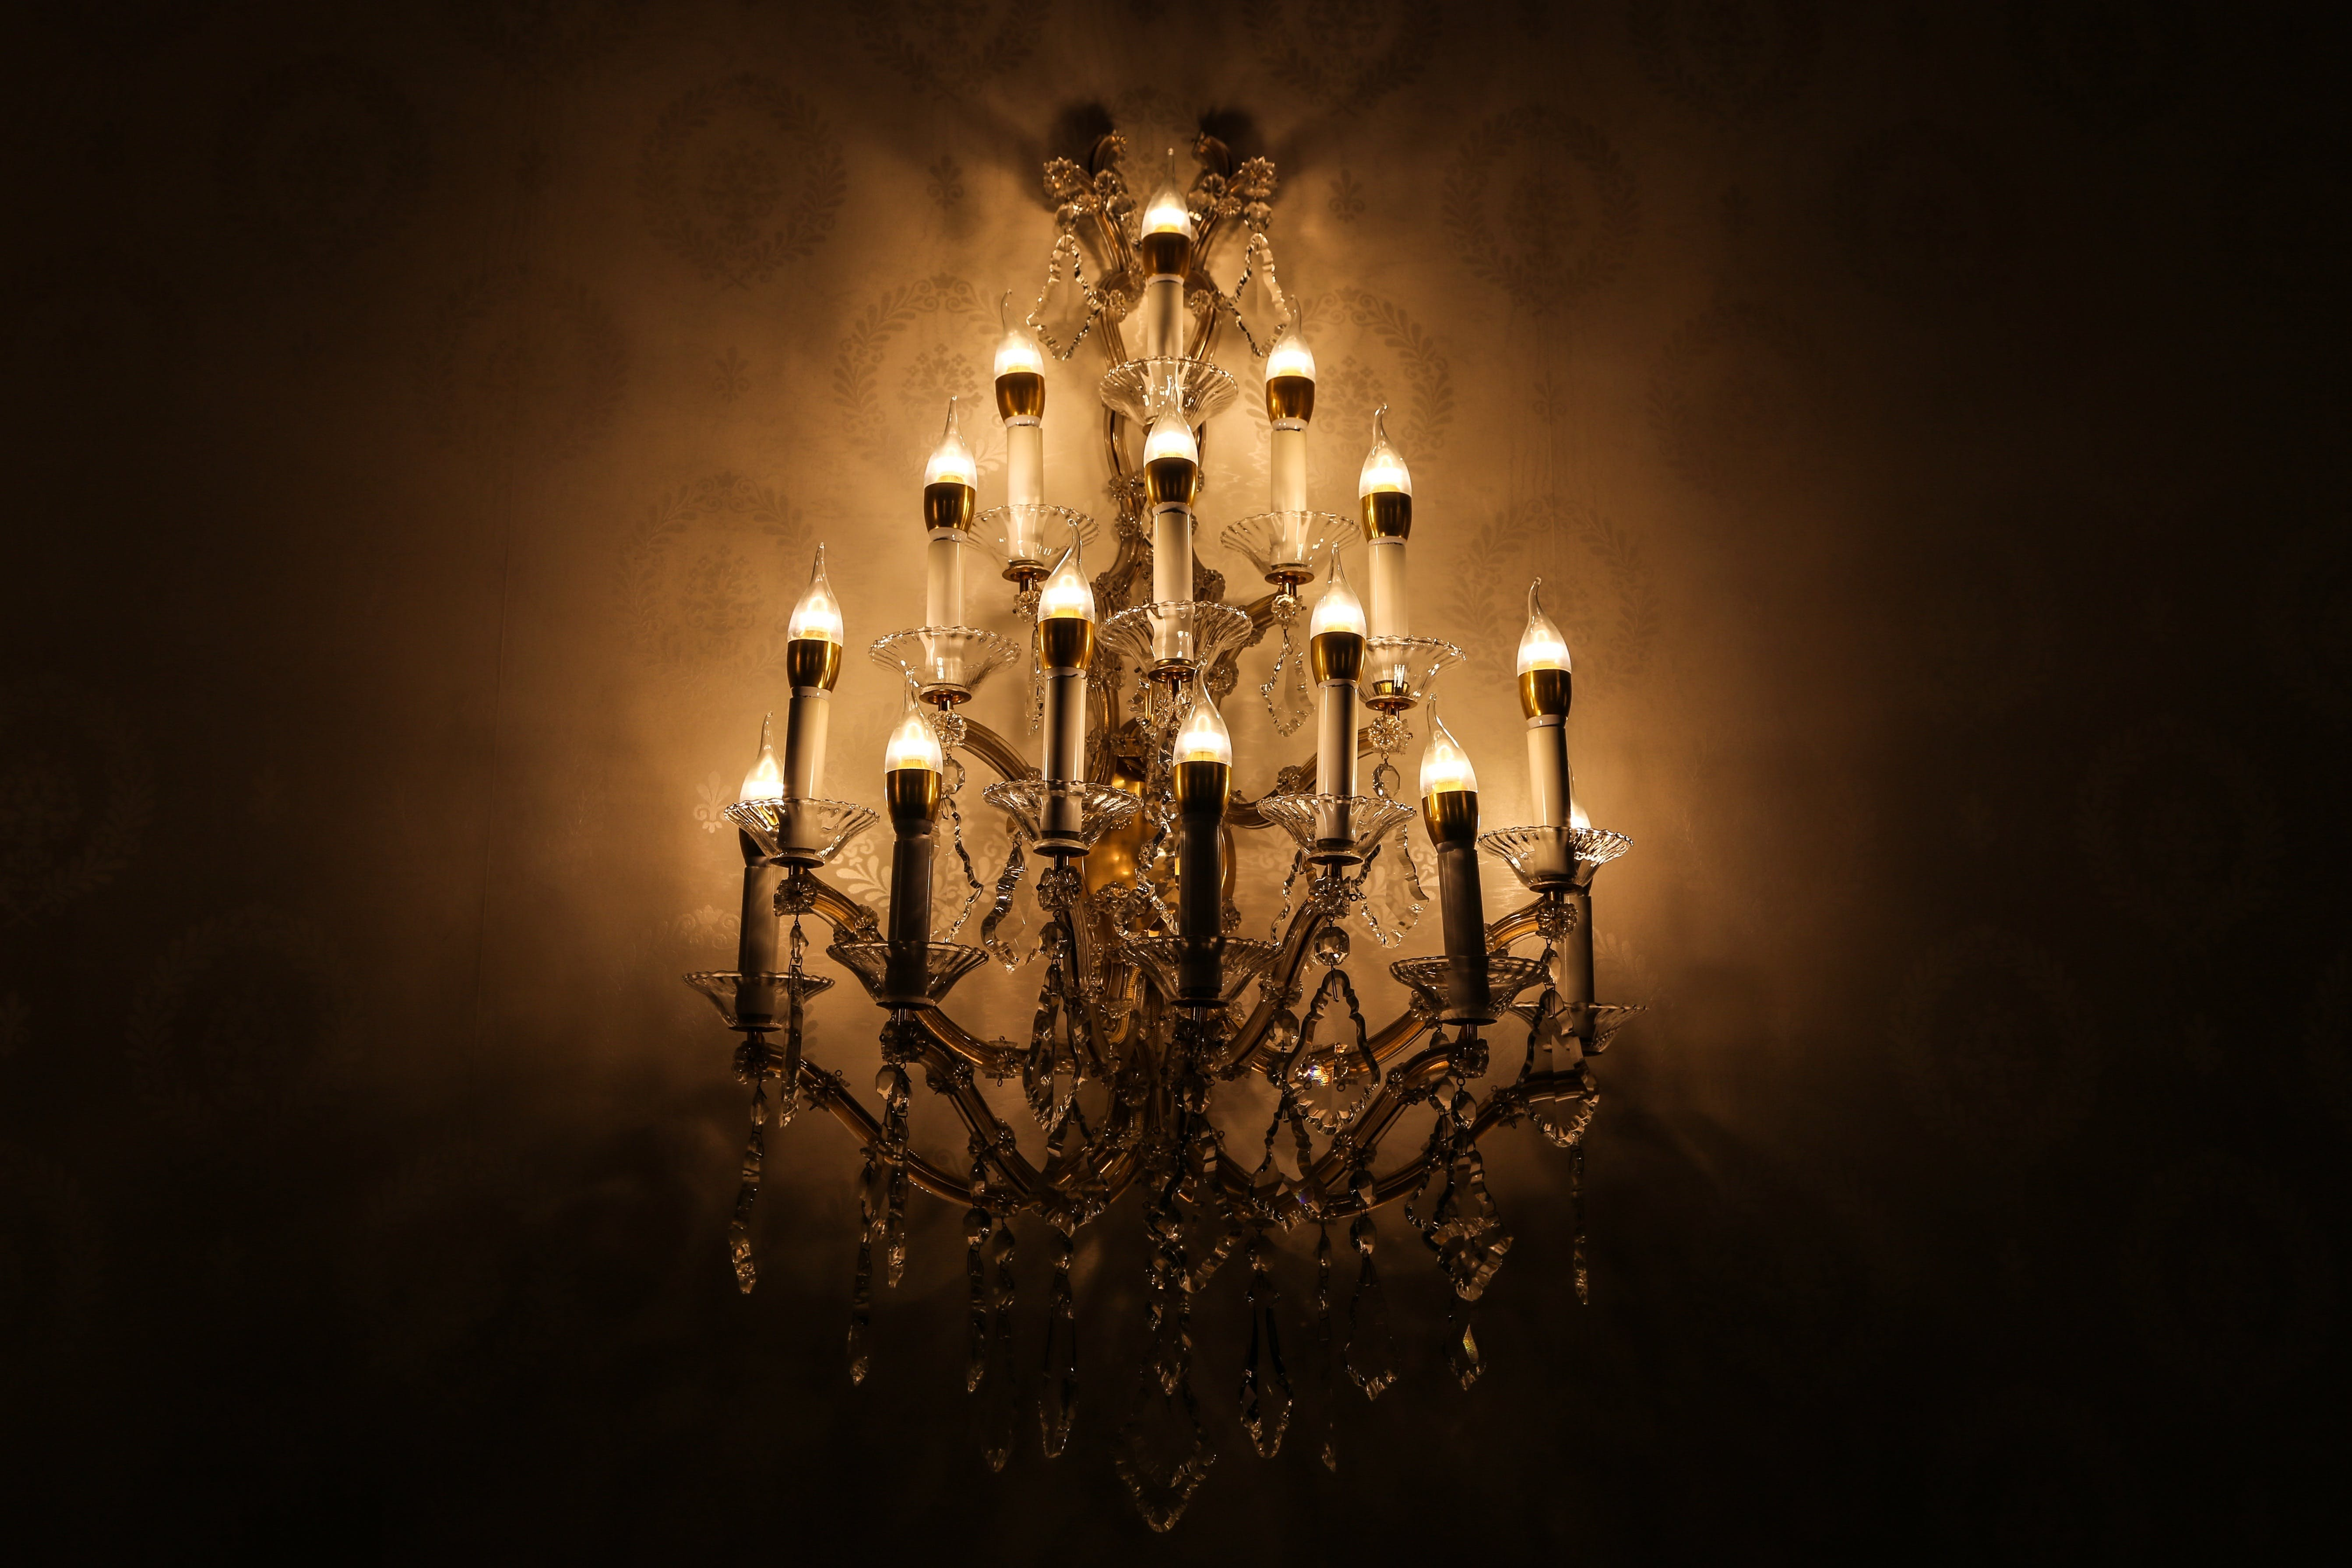 Black Chandelier in a Dark Room